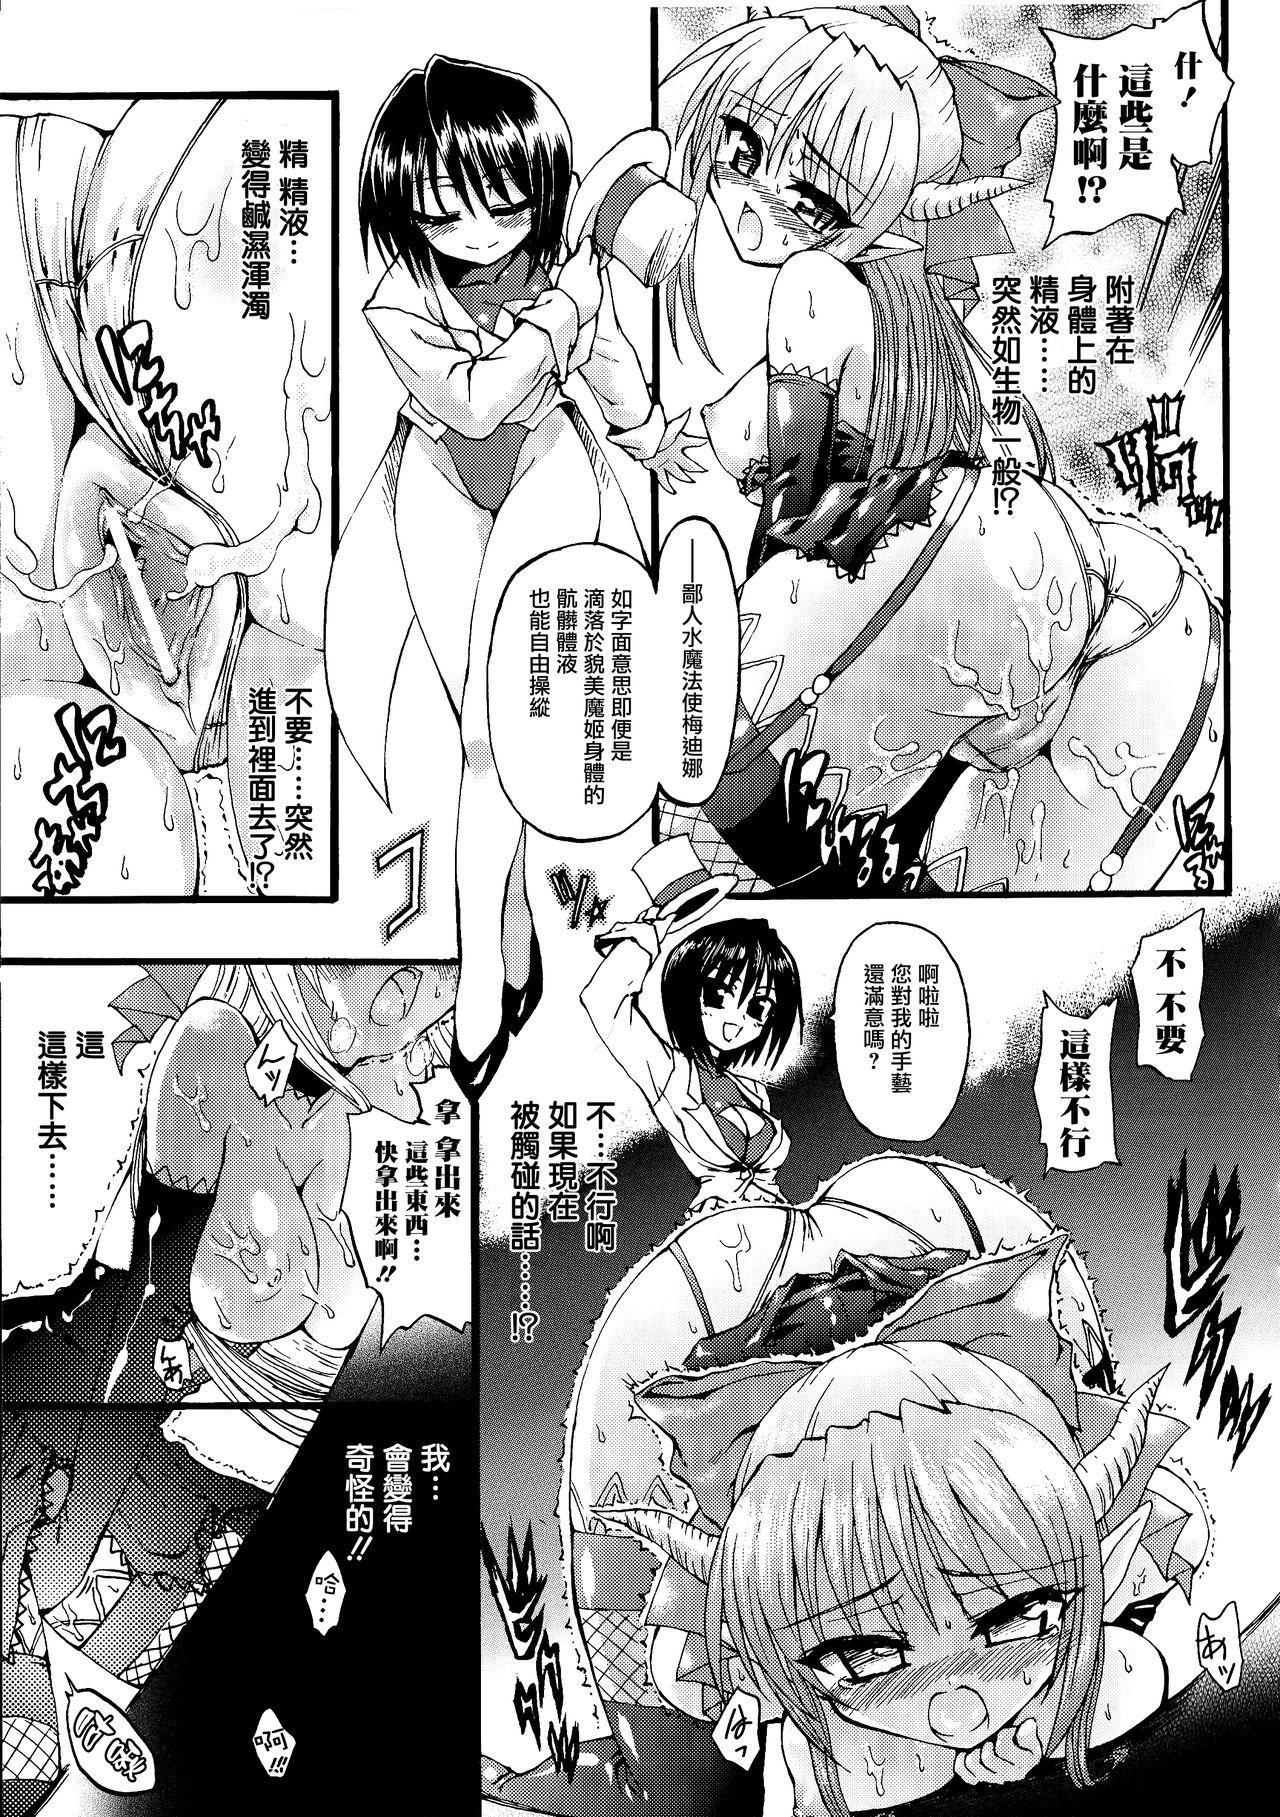 Ma ga Ochiru Yoru Demonic Imitator CH.1-7 37